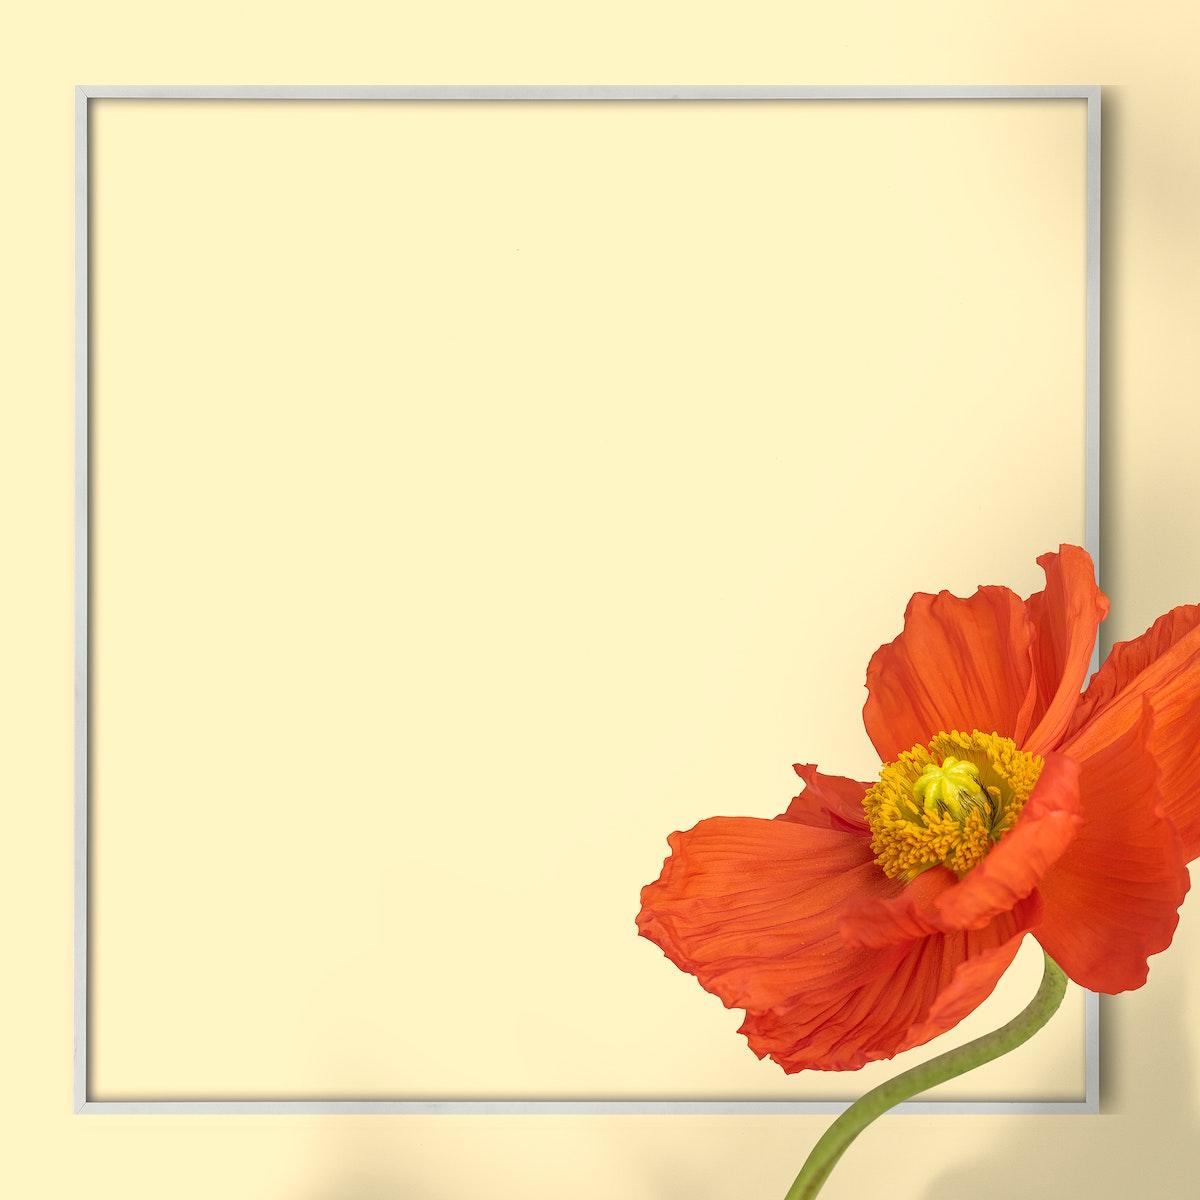 Red poppy flower frame on beige background